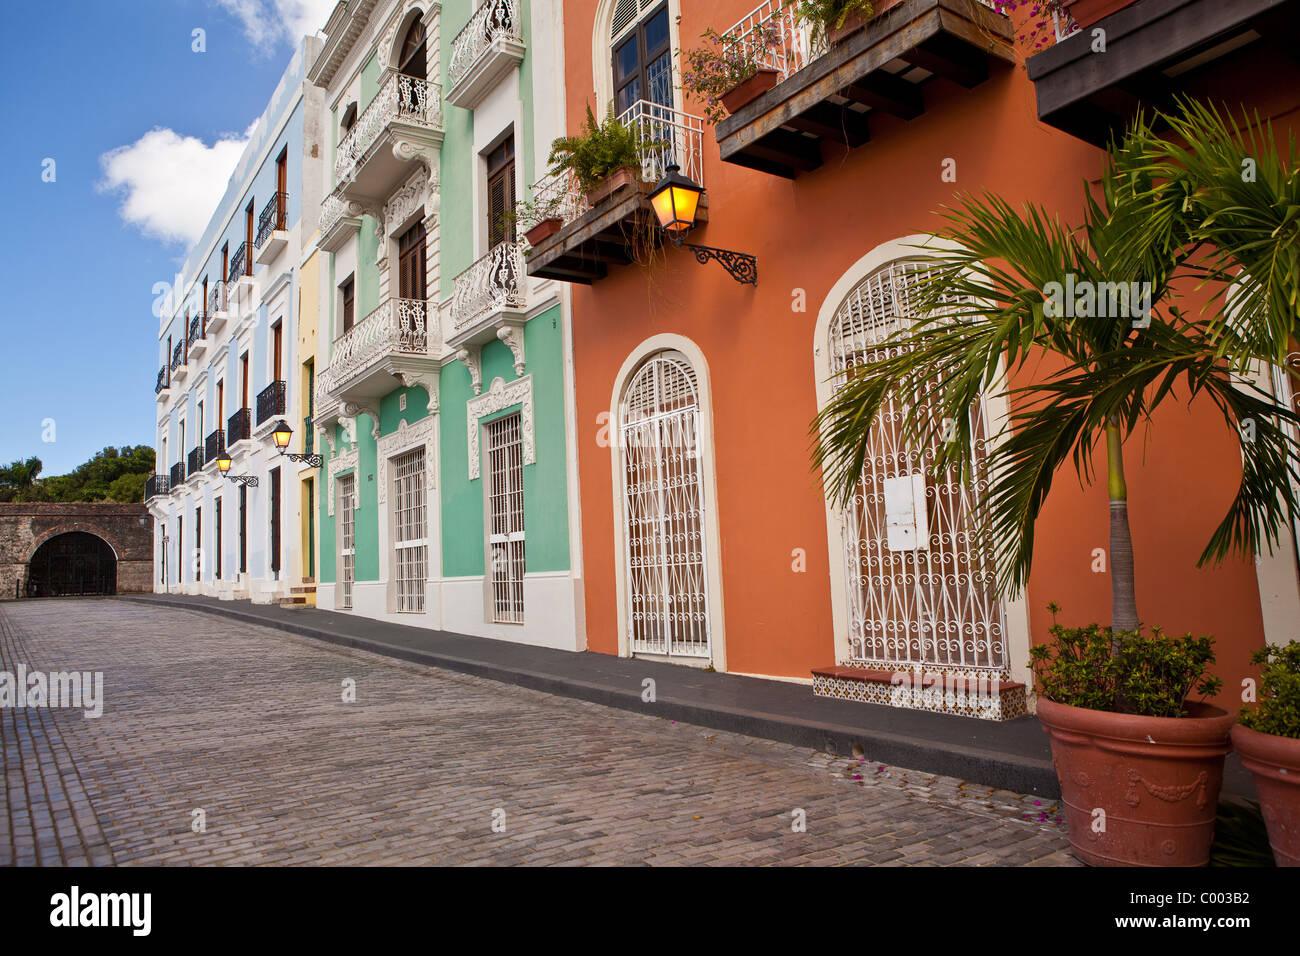 Historic traditional homes along Calle Recinto Sur Old San Juan, Puerto Rico. - Stock Image